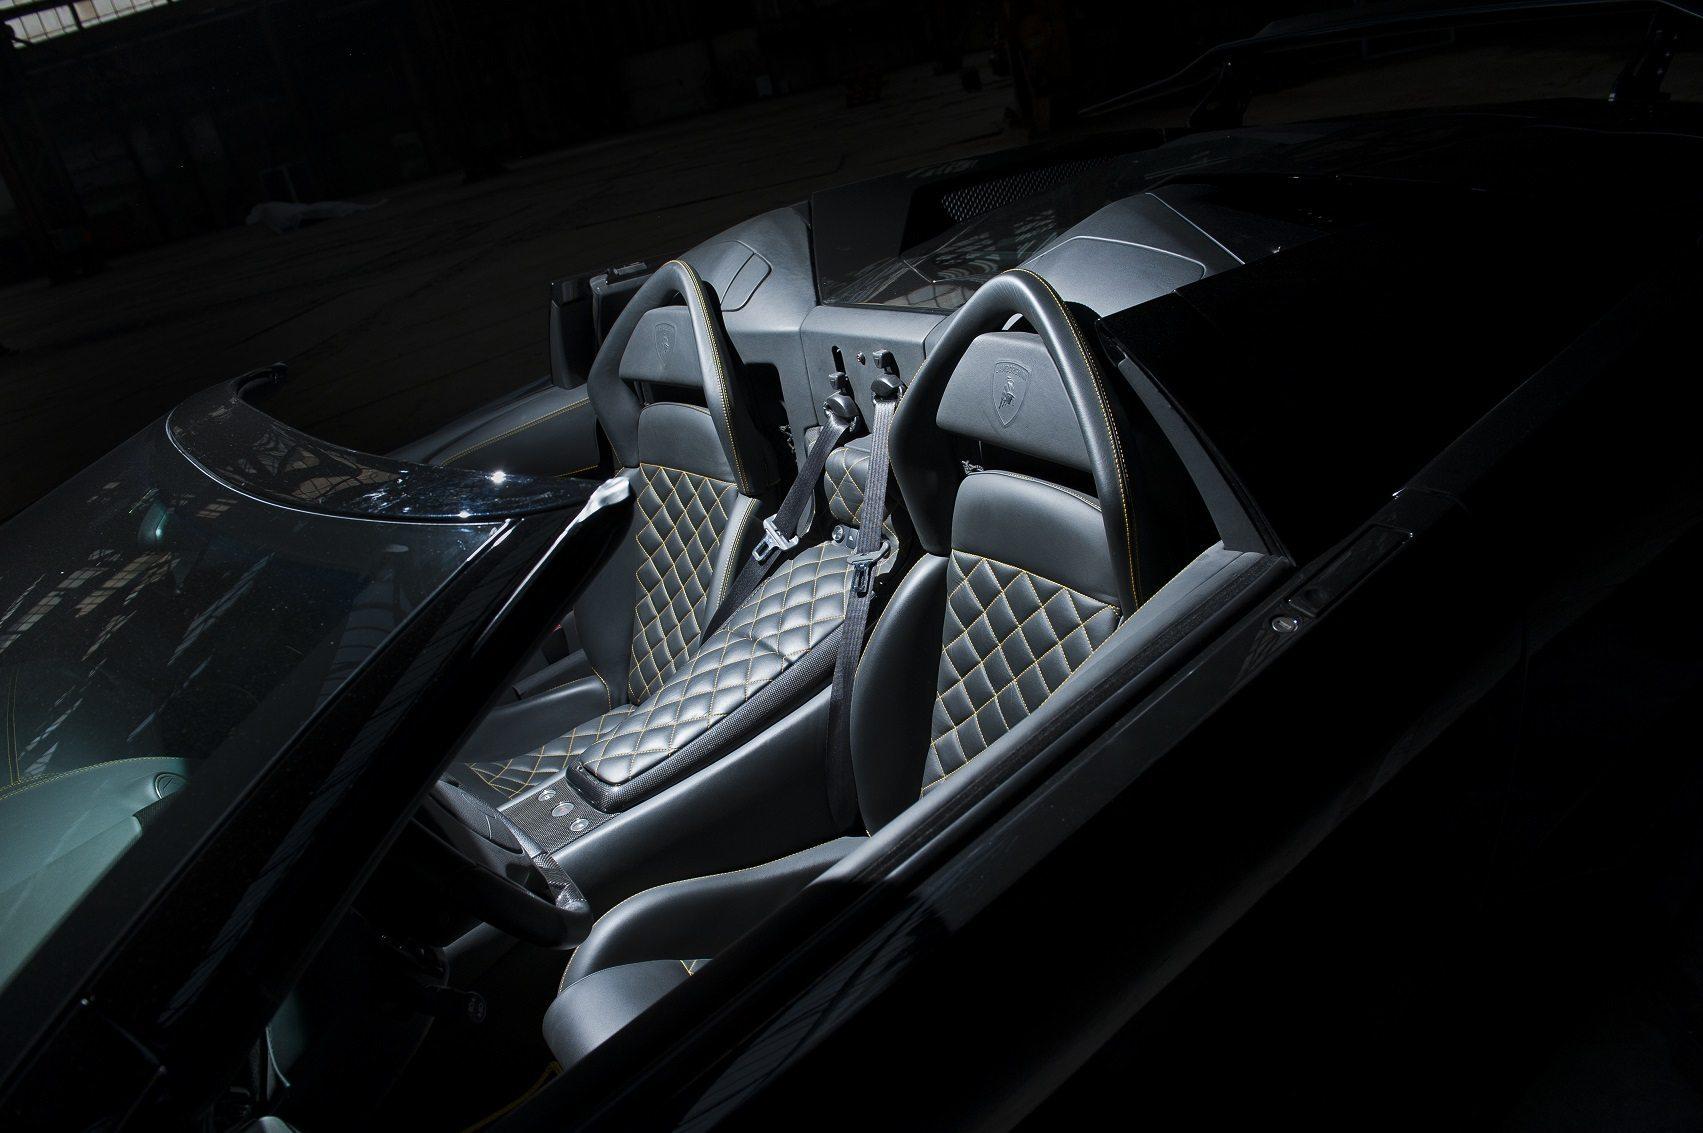 Liberty Walk Lamborghini Murciélago LP640 Roadster - www.hartvoorautos.nl